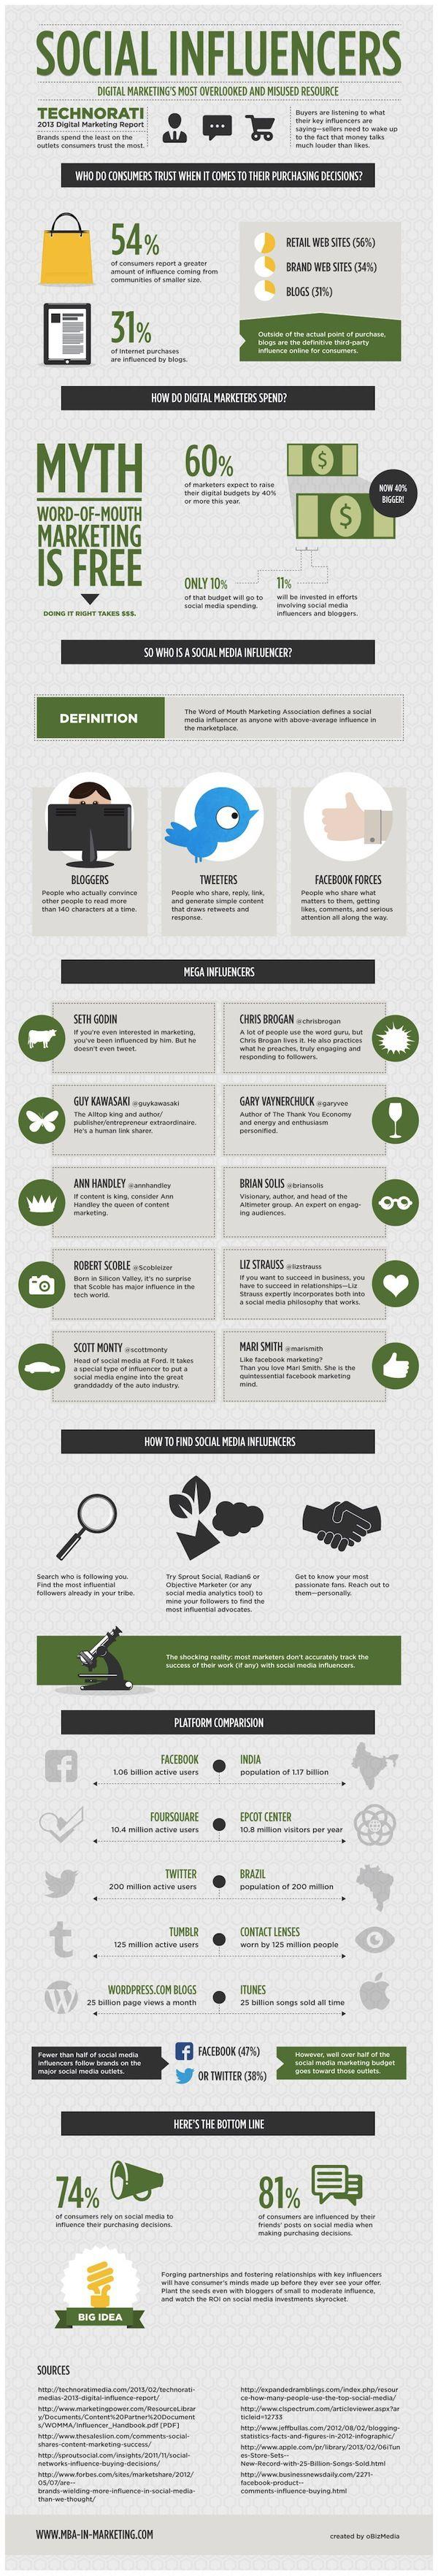 Best Marketing Digital  Digital Marketing Images On